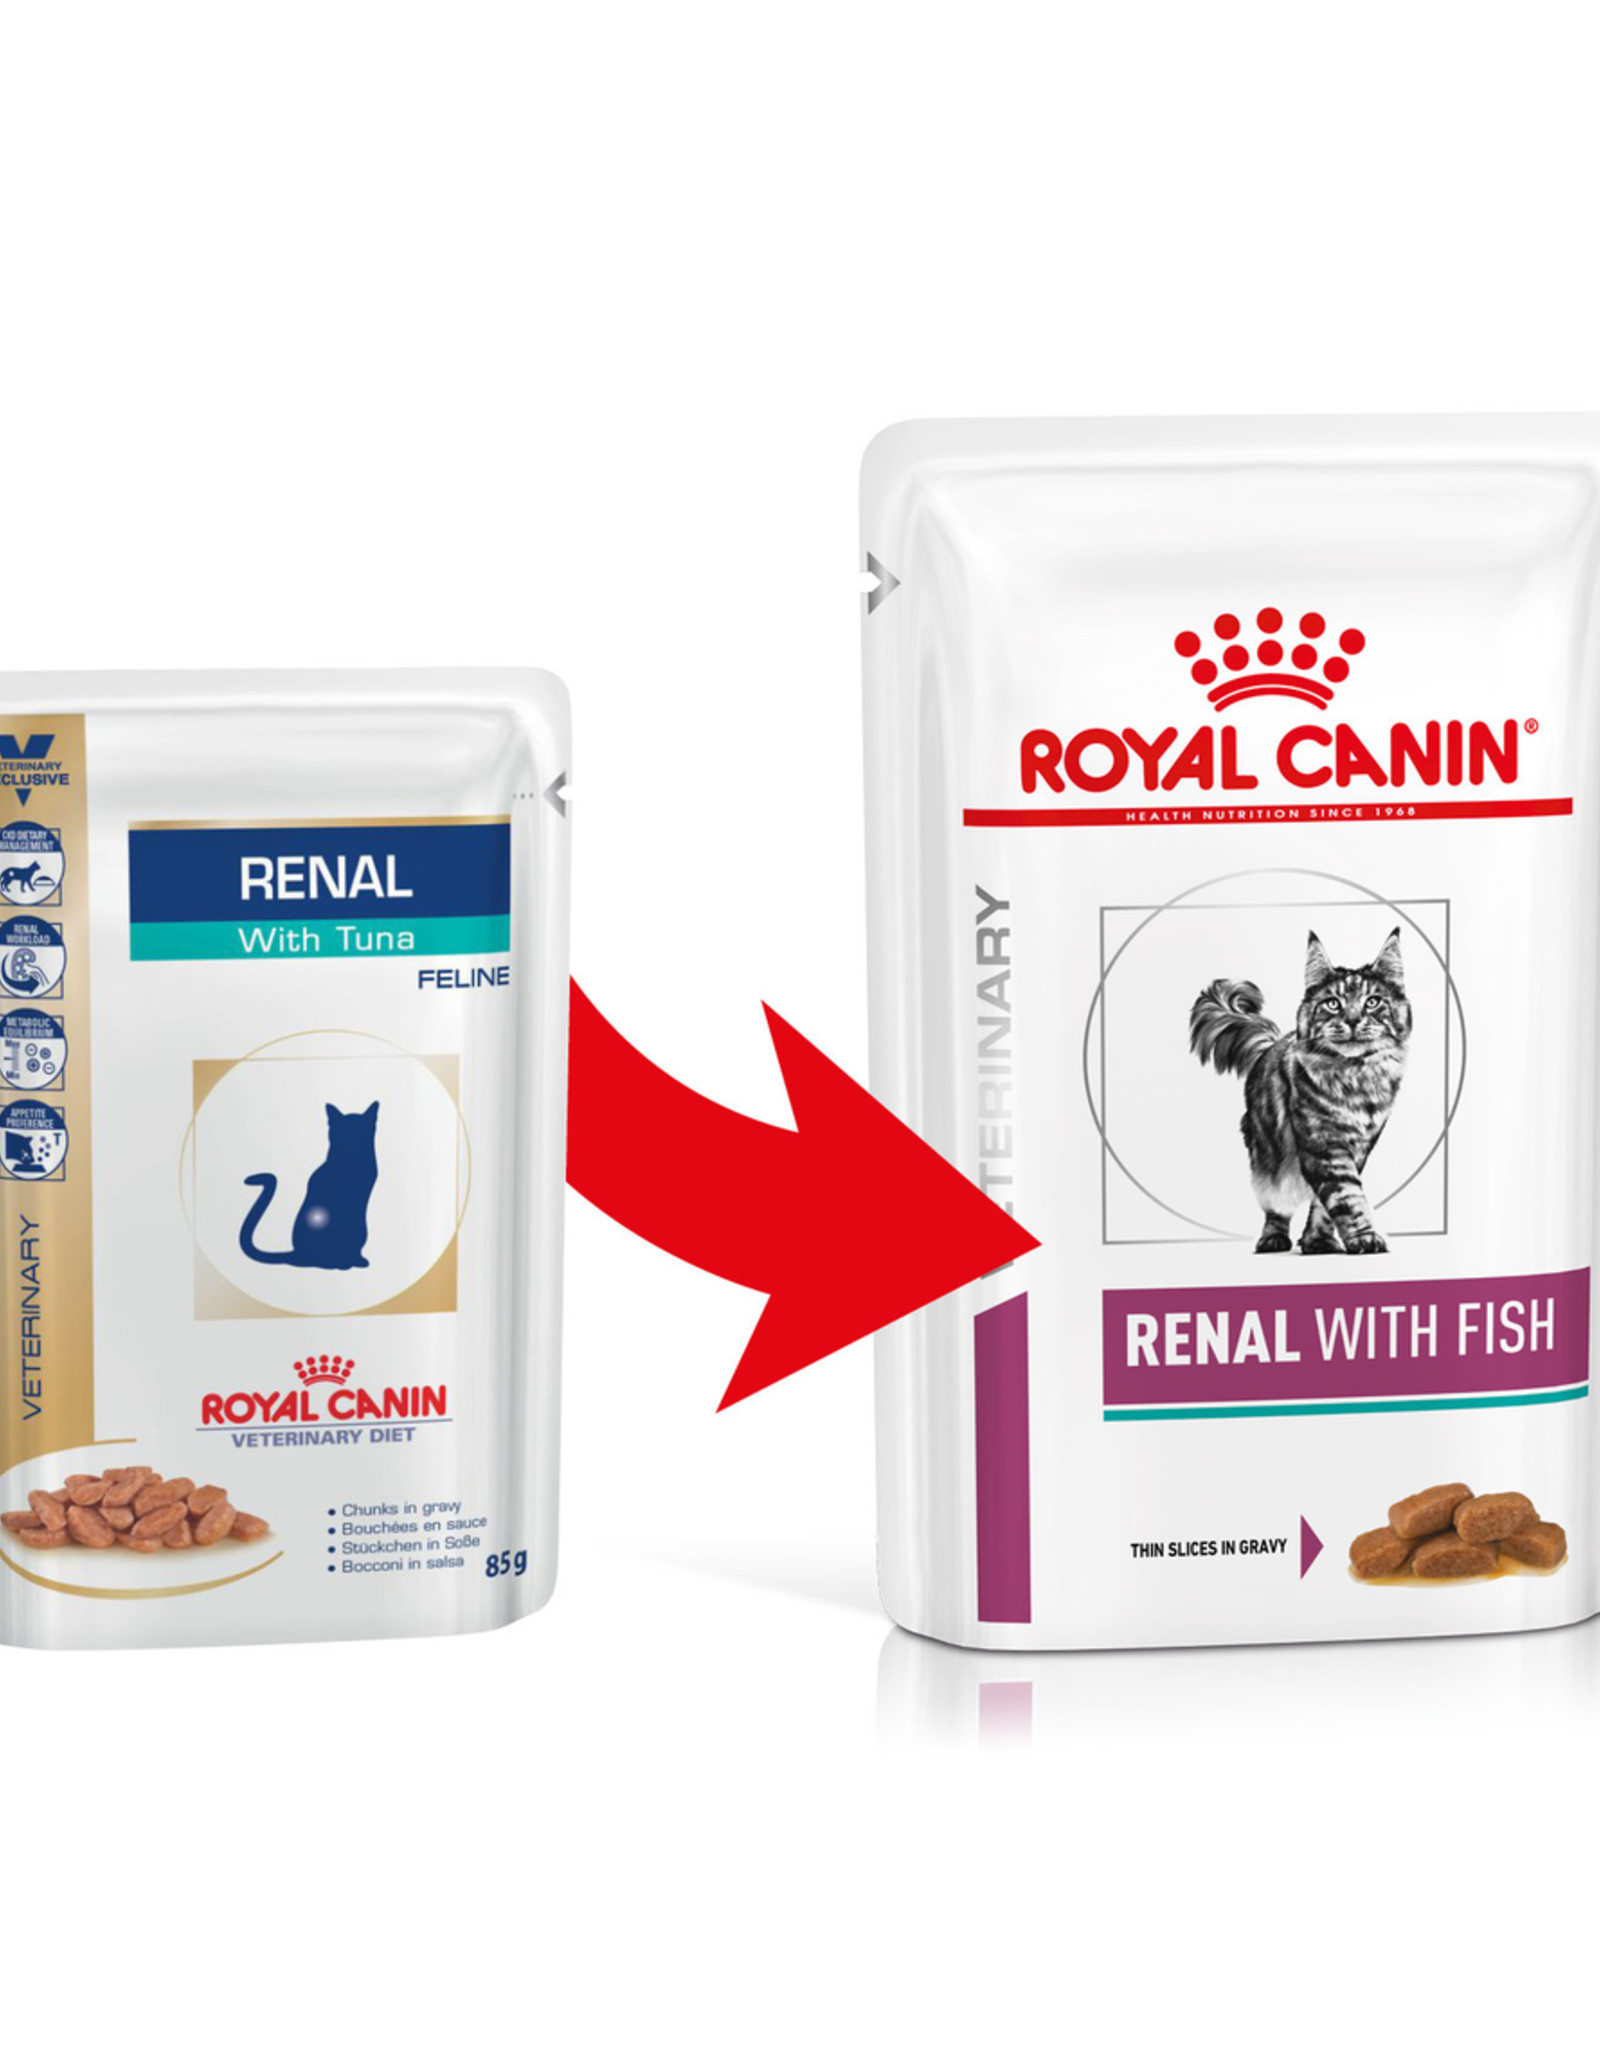 Royal Canin Royal Canin Vdiet Renal Feline Tuna 12x85gr (pouch)